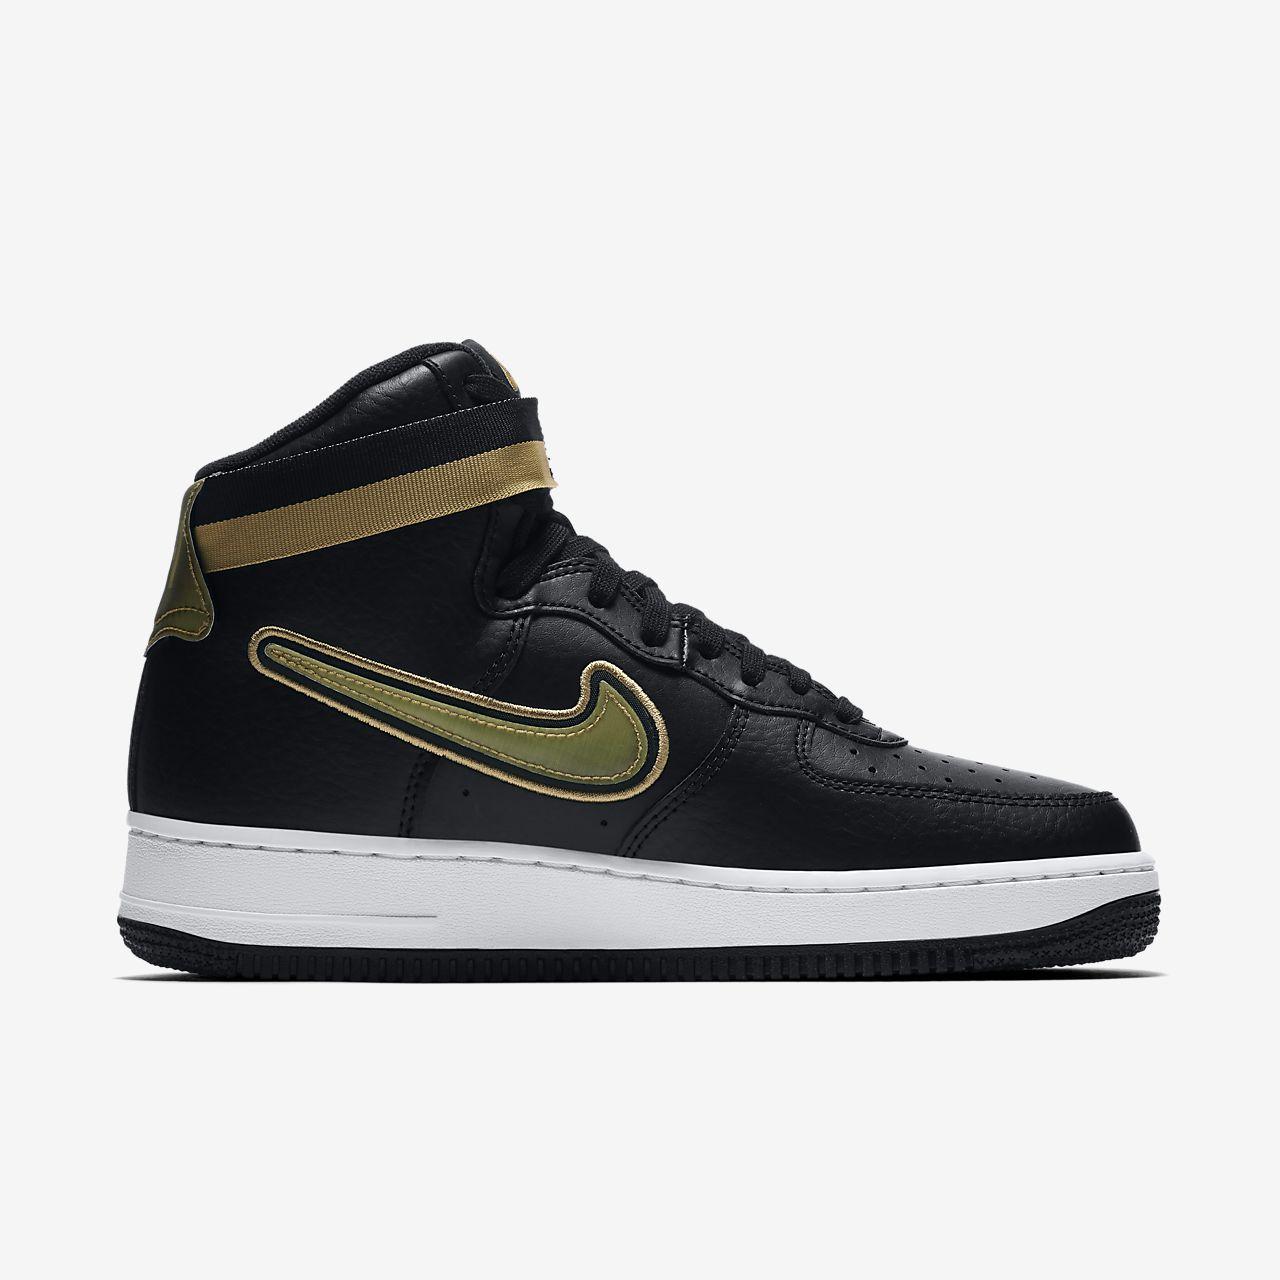 pretty nice 6adec 7c3f9 Scarpa Nike Air Force 1 High '07 LV8 Sport NBA - Uomo. Nike.com IT